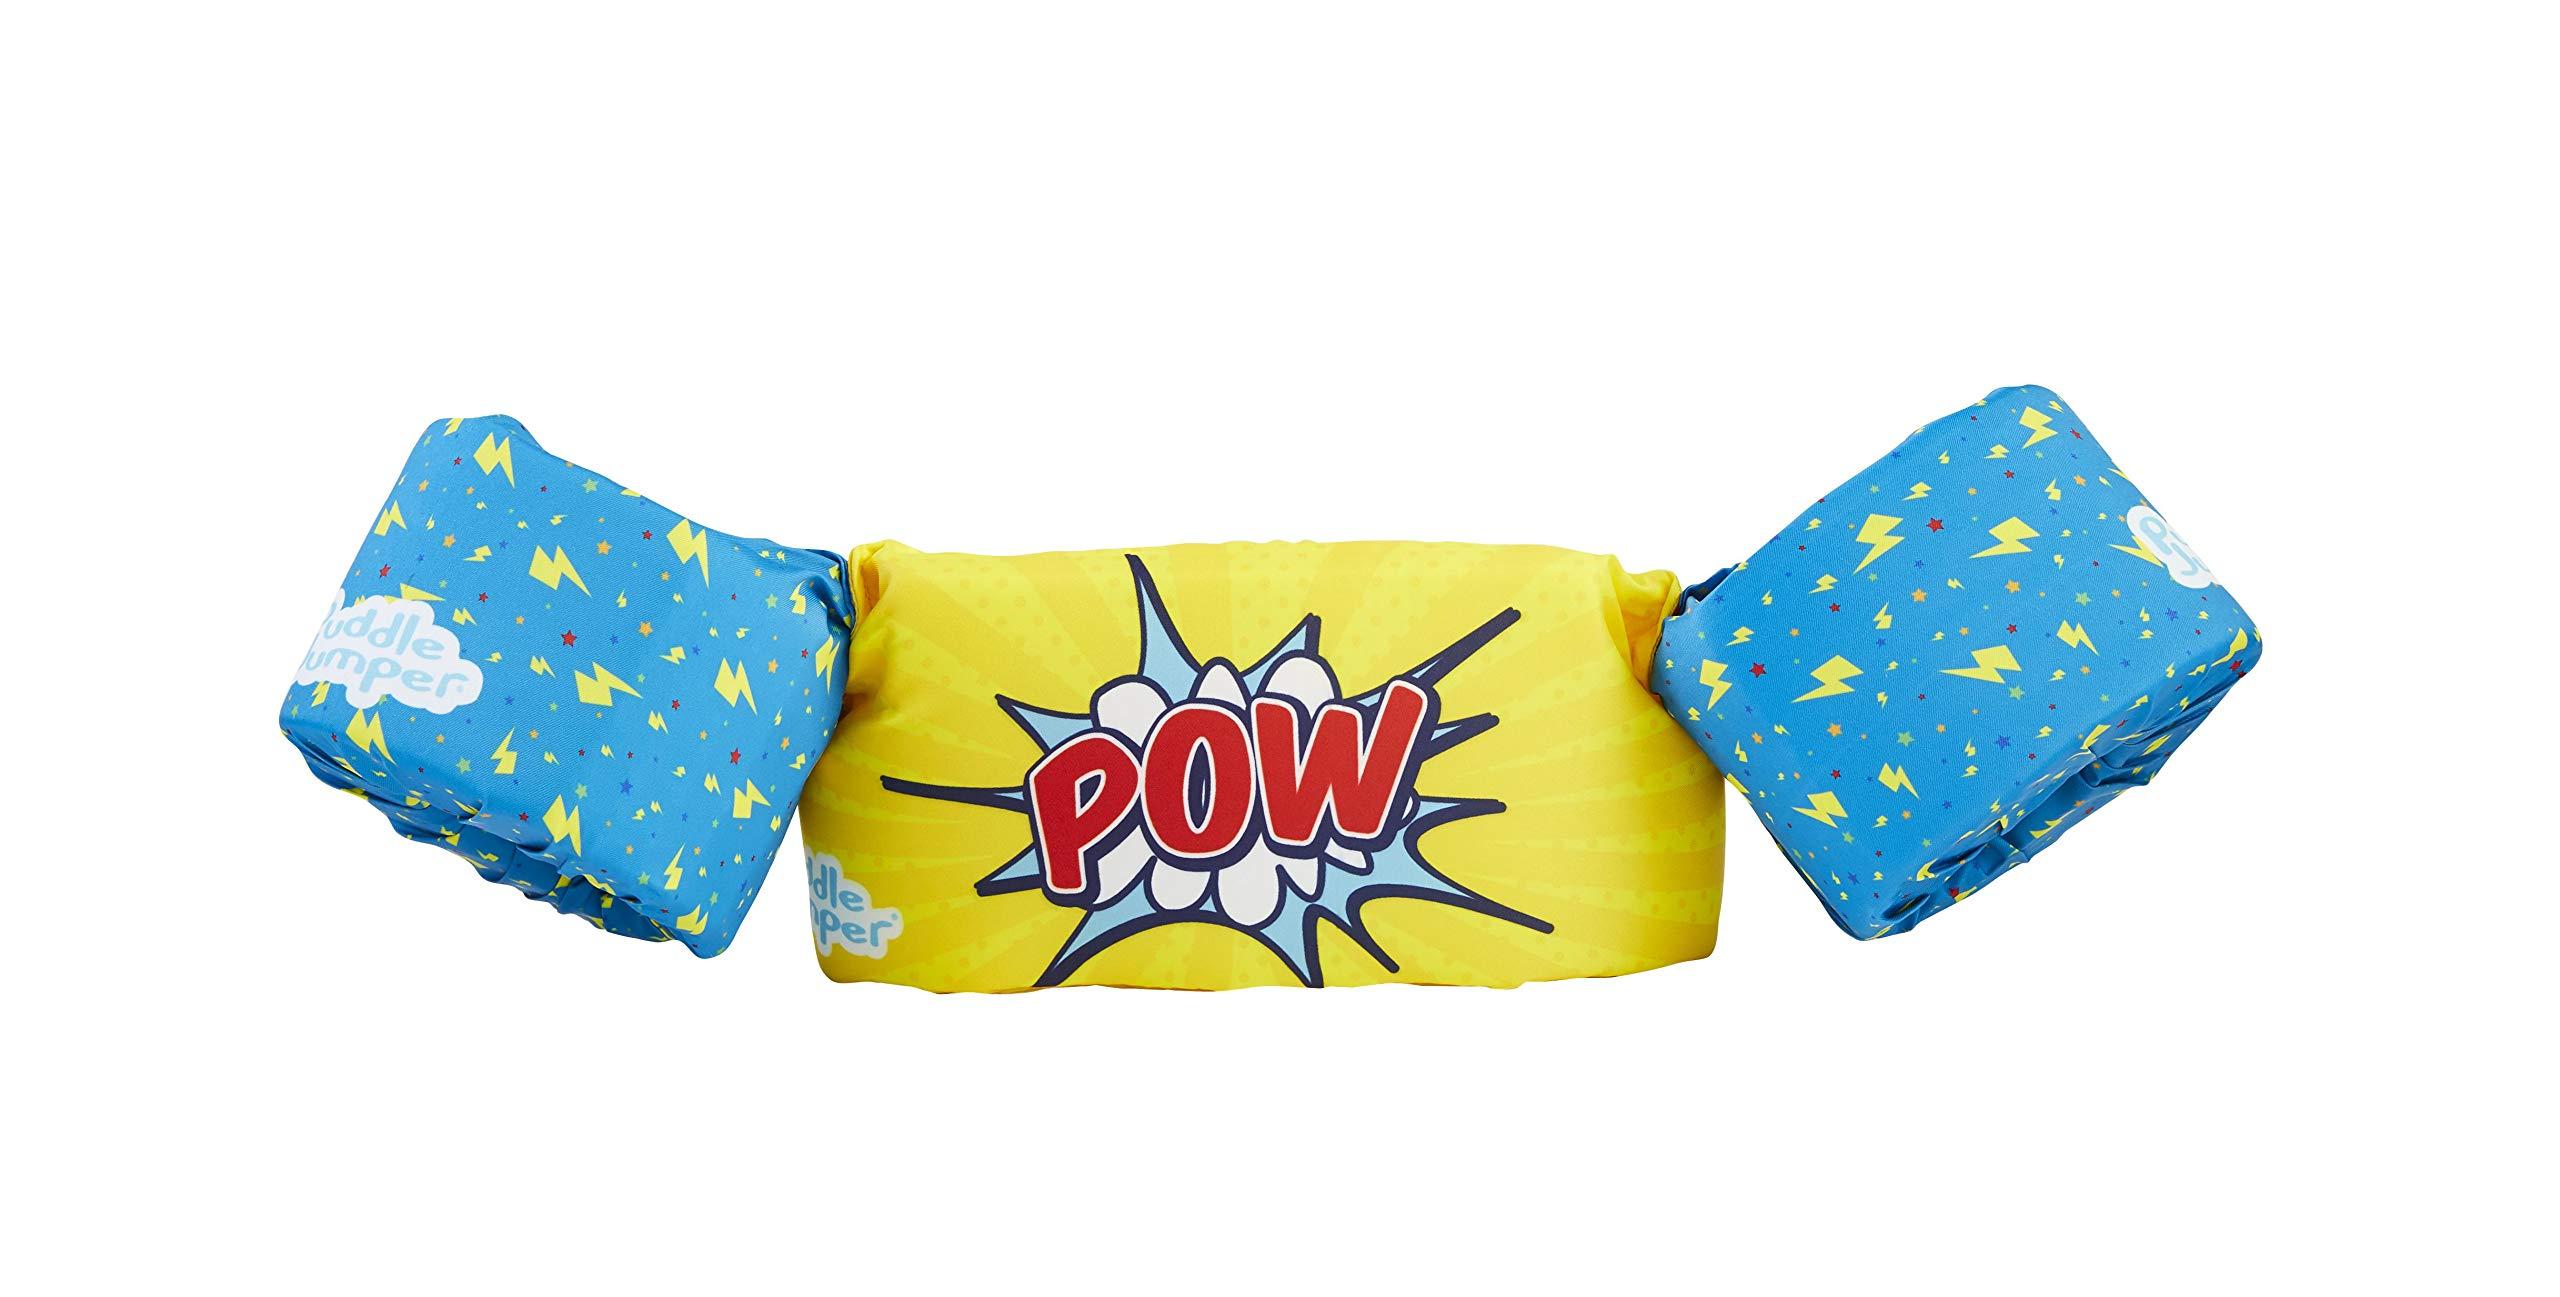 Stearns Puddle Jumper Kids Life Jacket | Life Vest for Children, Pow, 30-50 Pounds